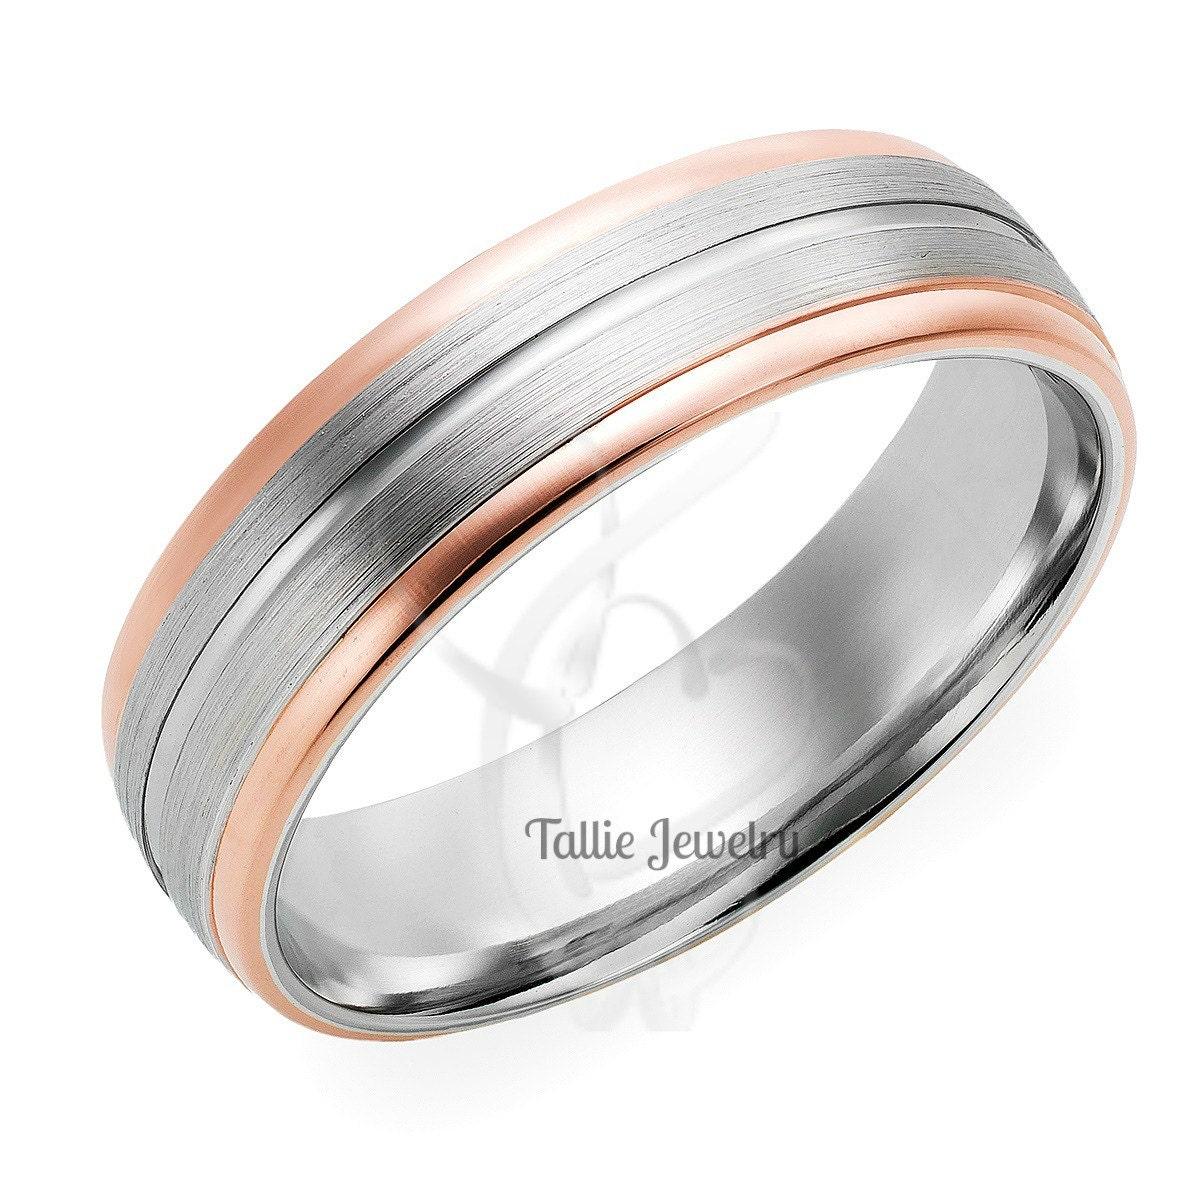 mens wedding rings,14k gold two tone wedding rings,womens wedding